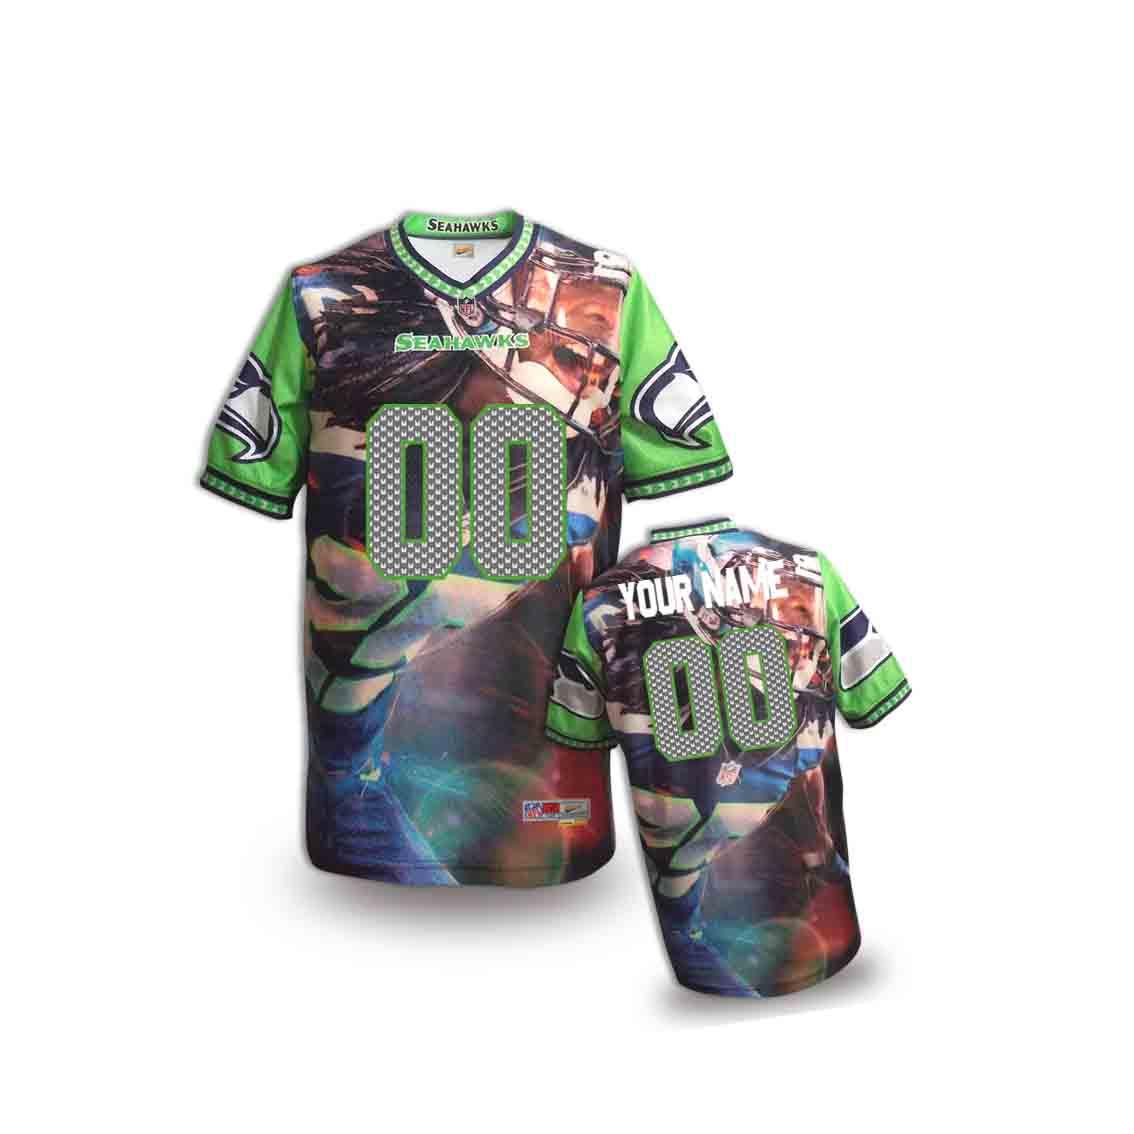 Nike Seahawks Customized Fashion Stitched Youth Jerseys16